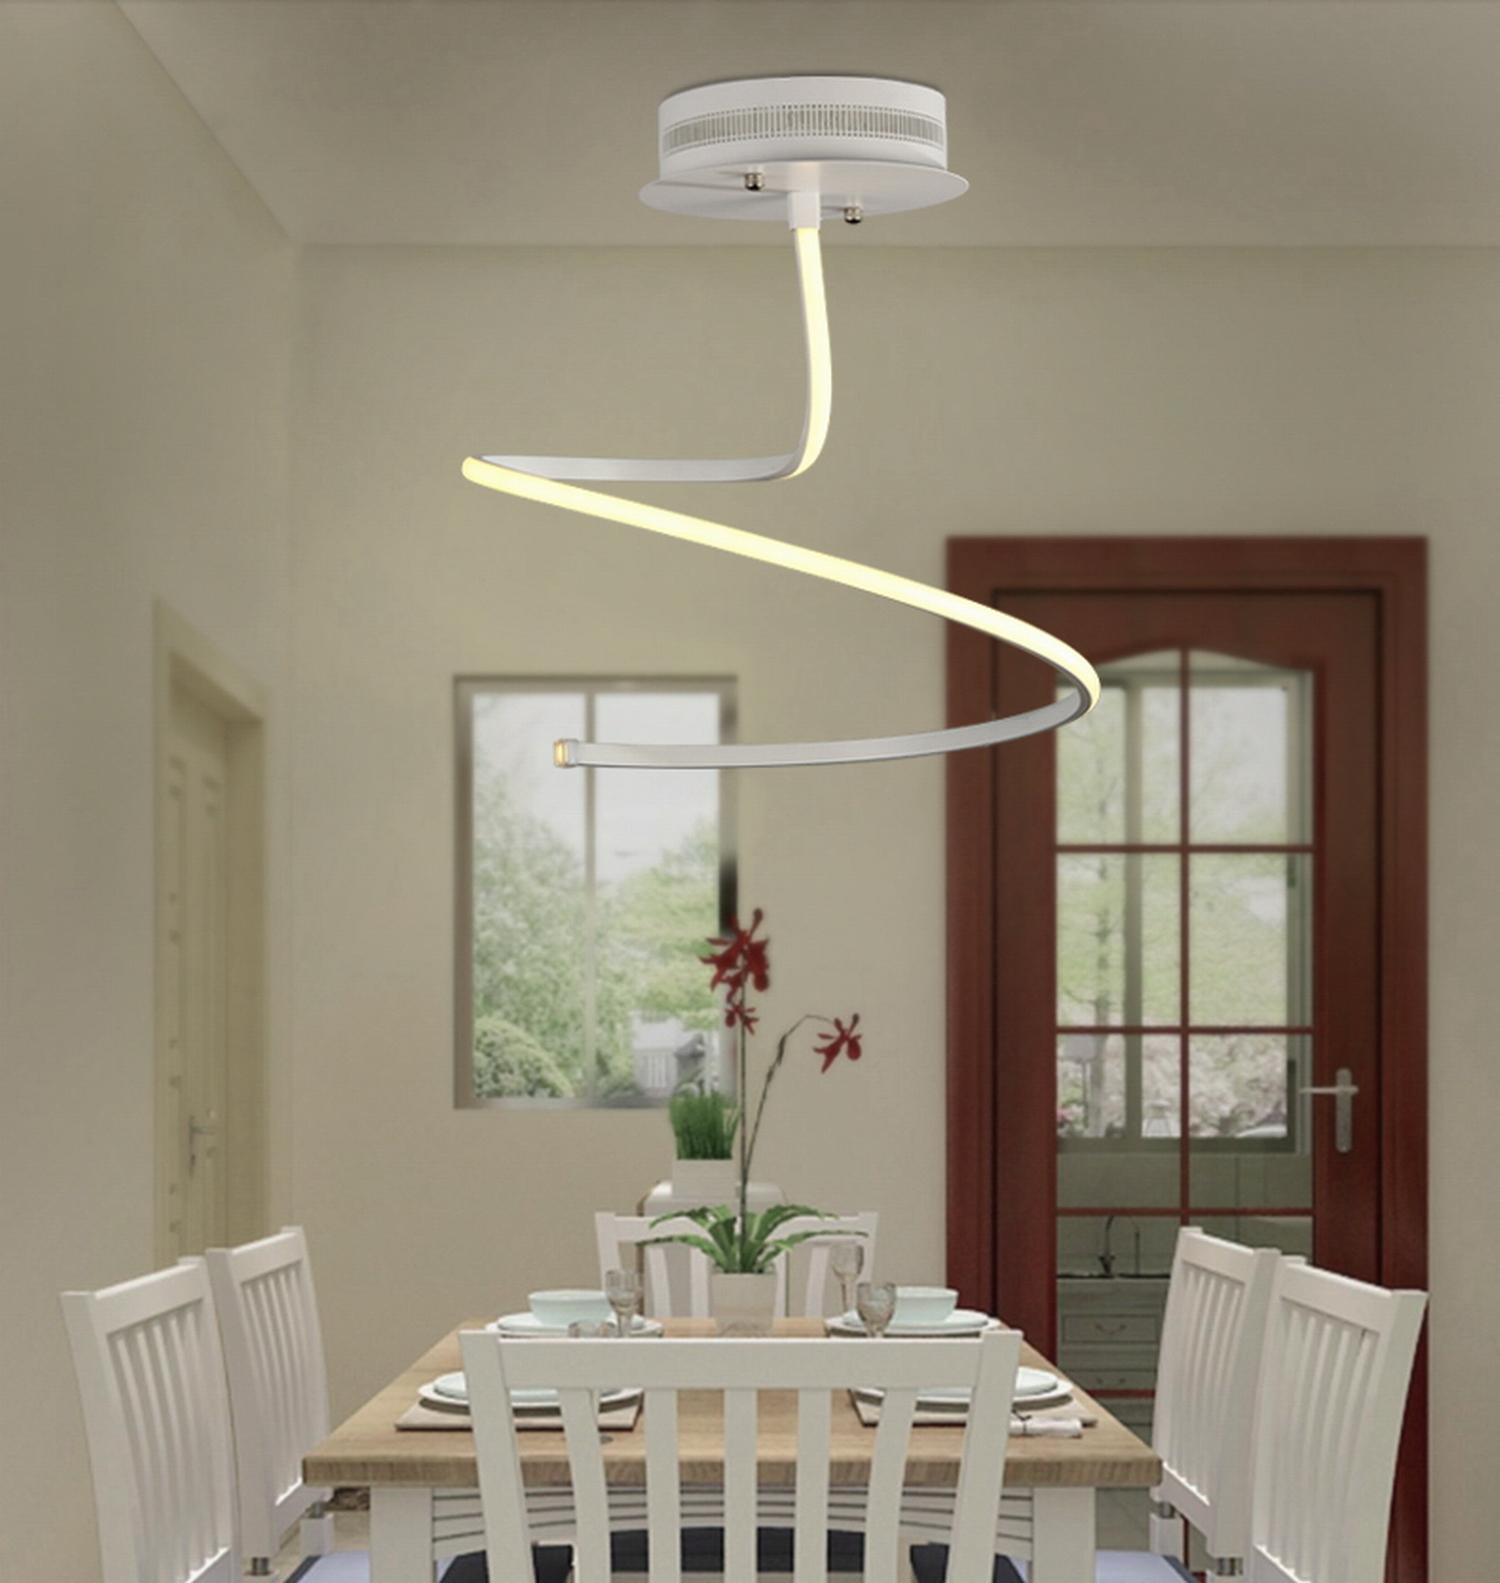 woward woward 33w led deckenleuchten design deckenlampe. Black Bedroom Furniture Sets. Home Design Ideas